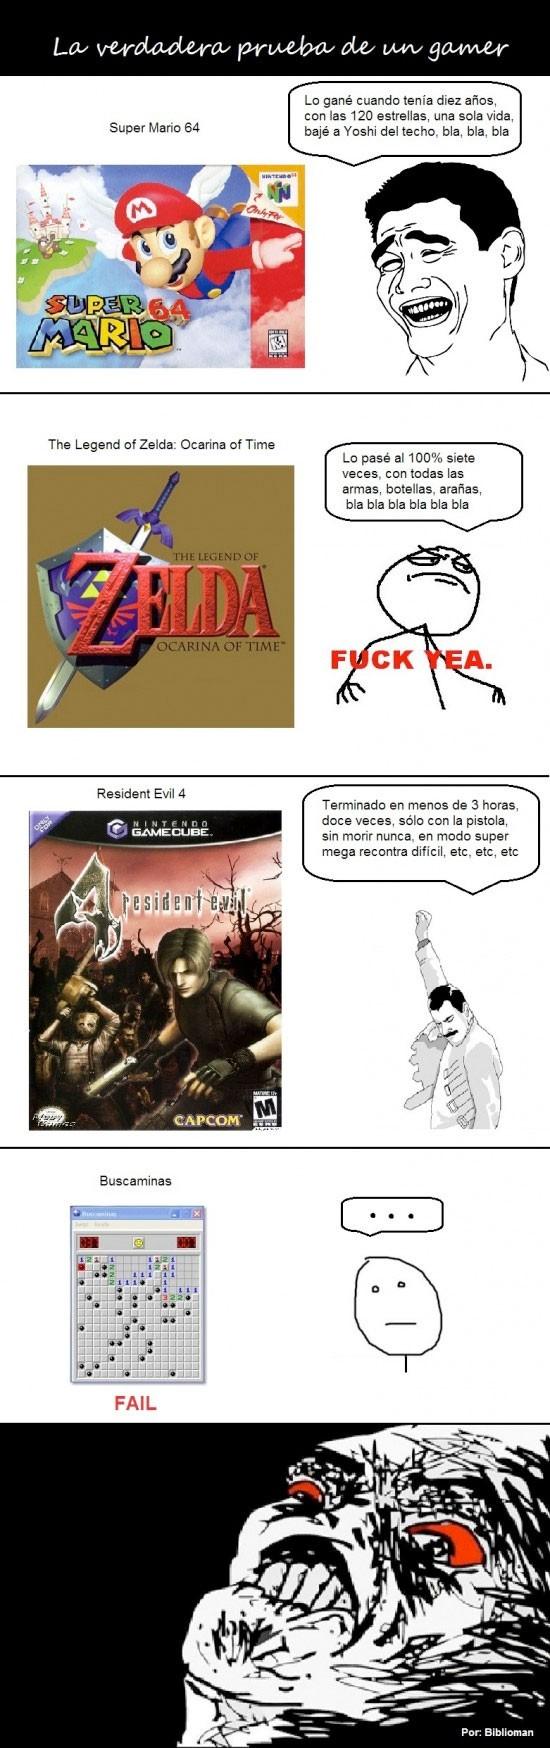 desafío,gamer,videojuegos